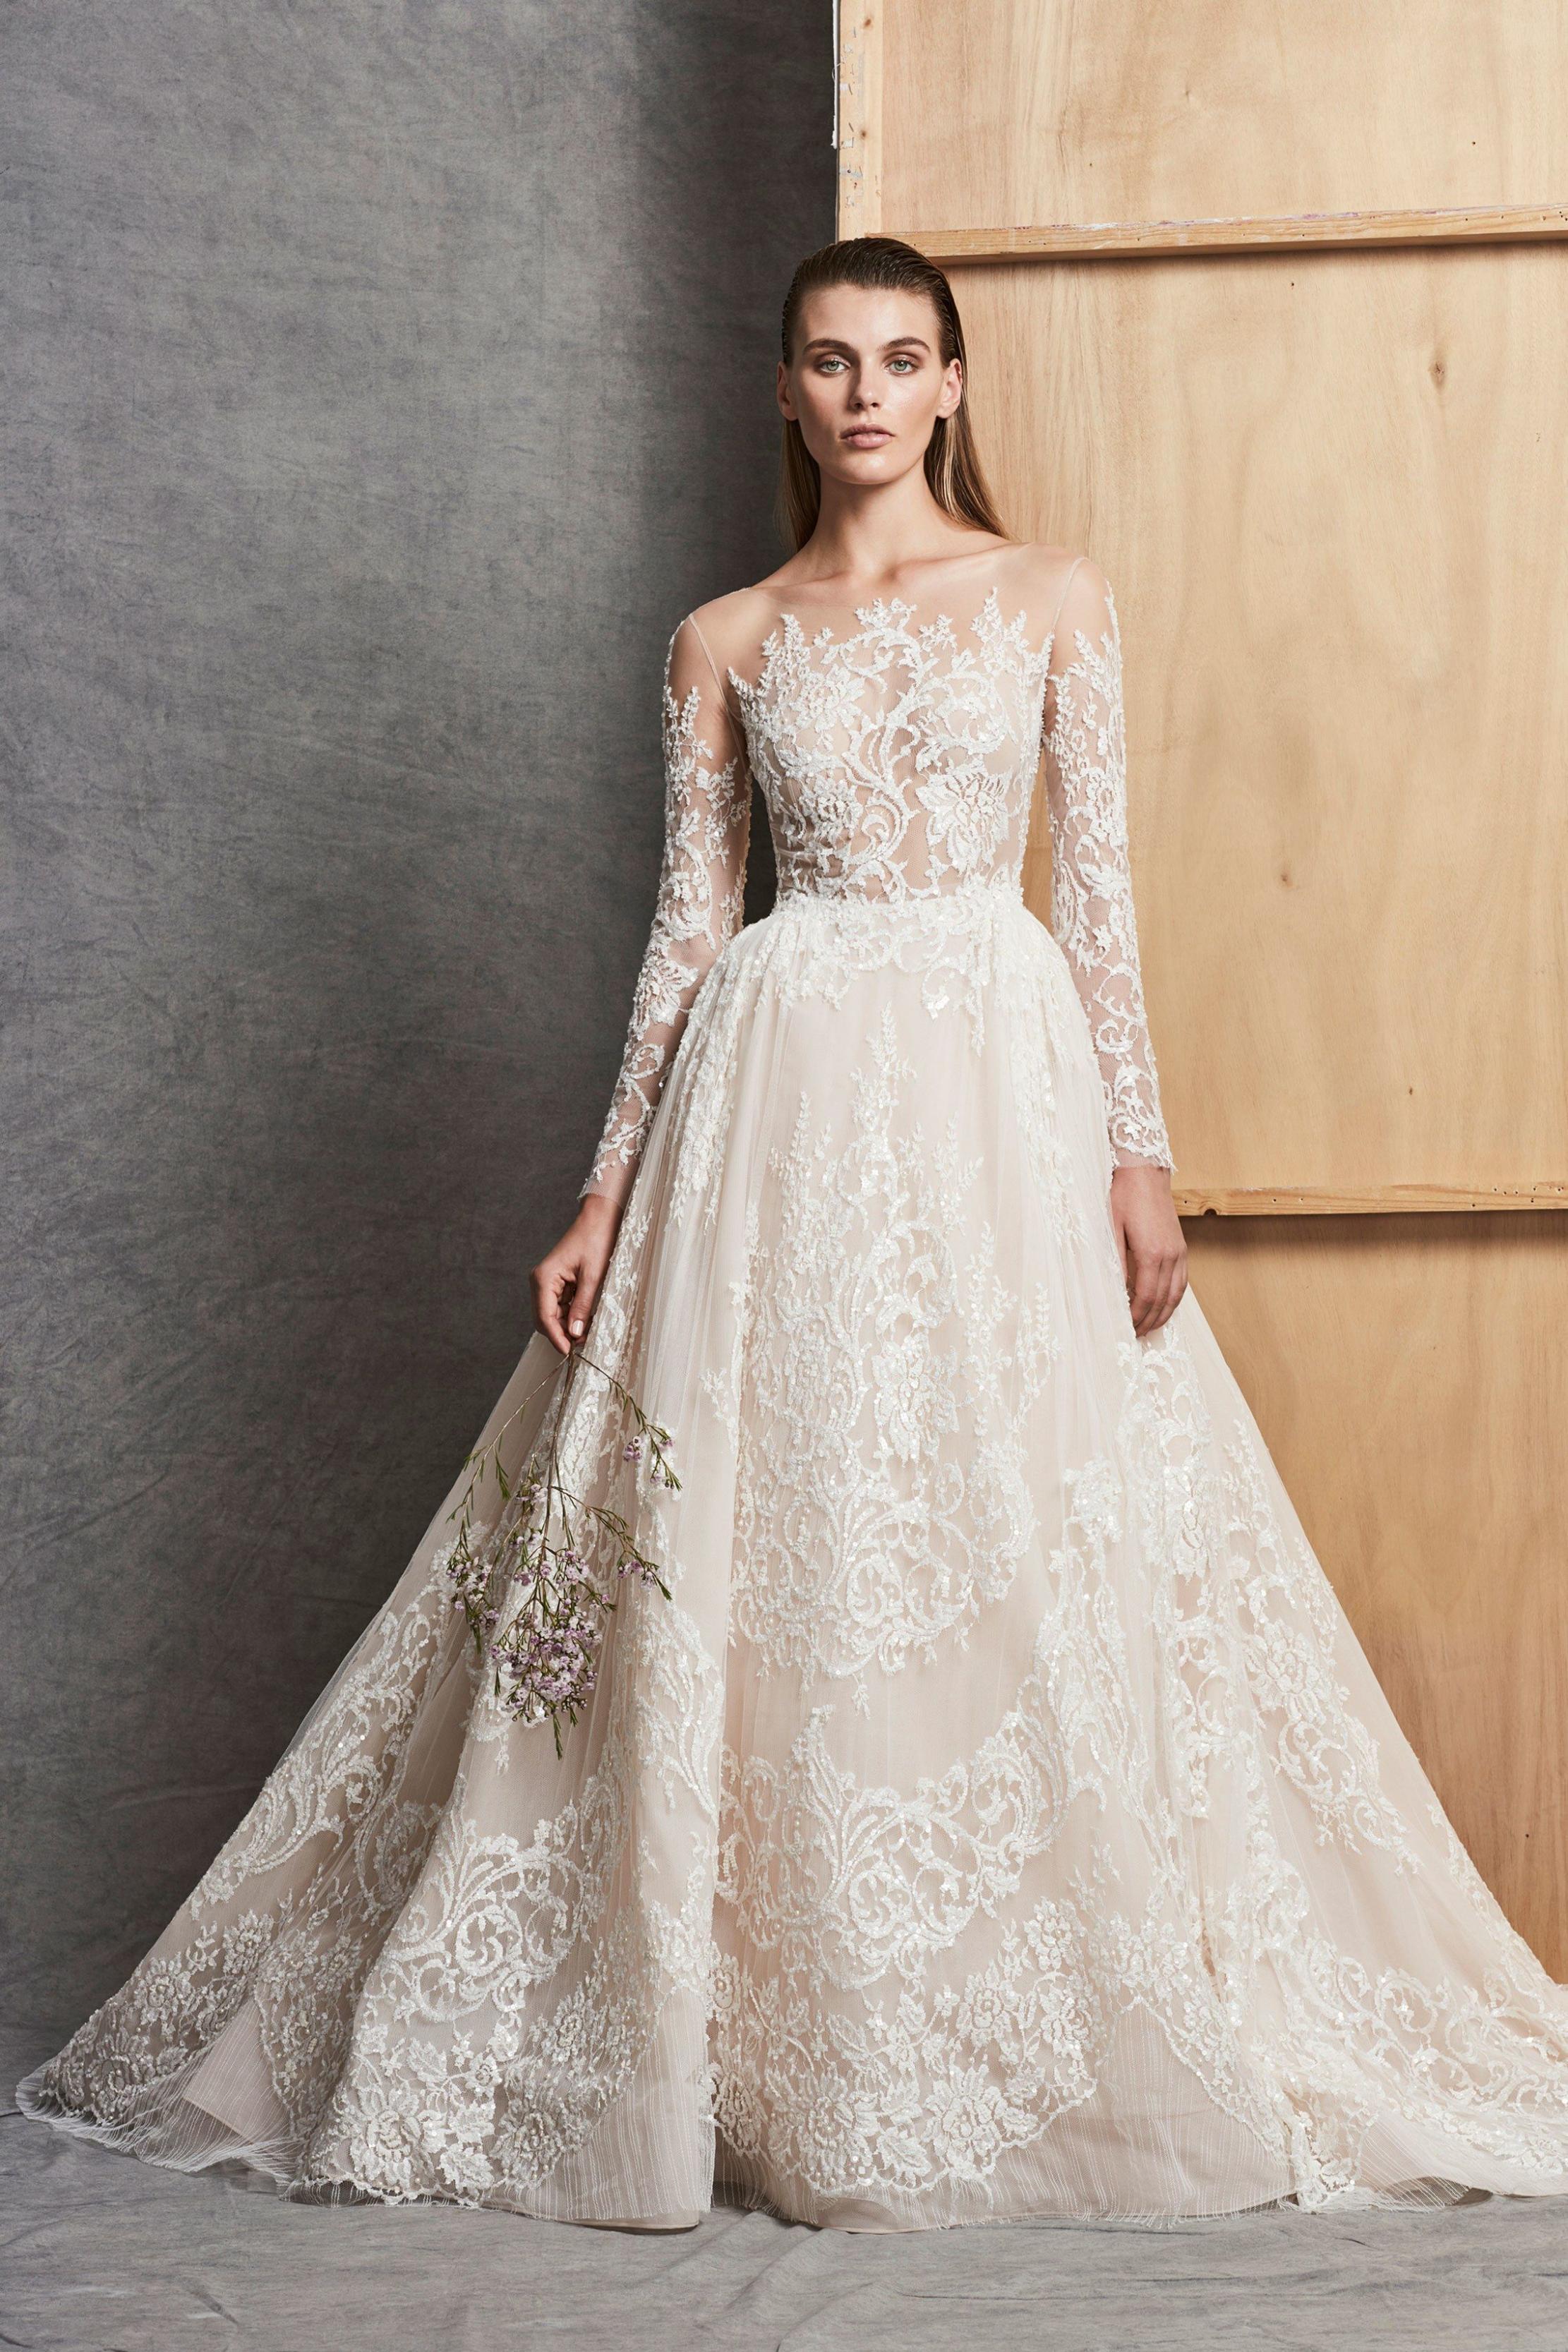 بالصور فساتين زفاف زهير مراد 2019 , فساتين زفاف زهير مراد واجمد فساتين 5814 12